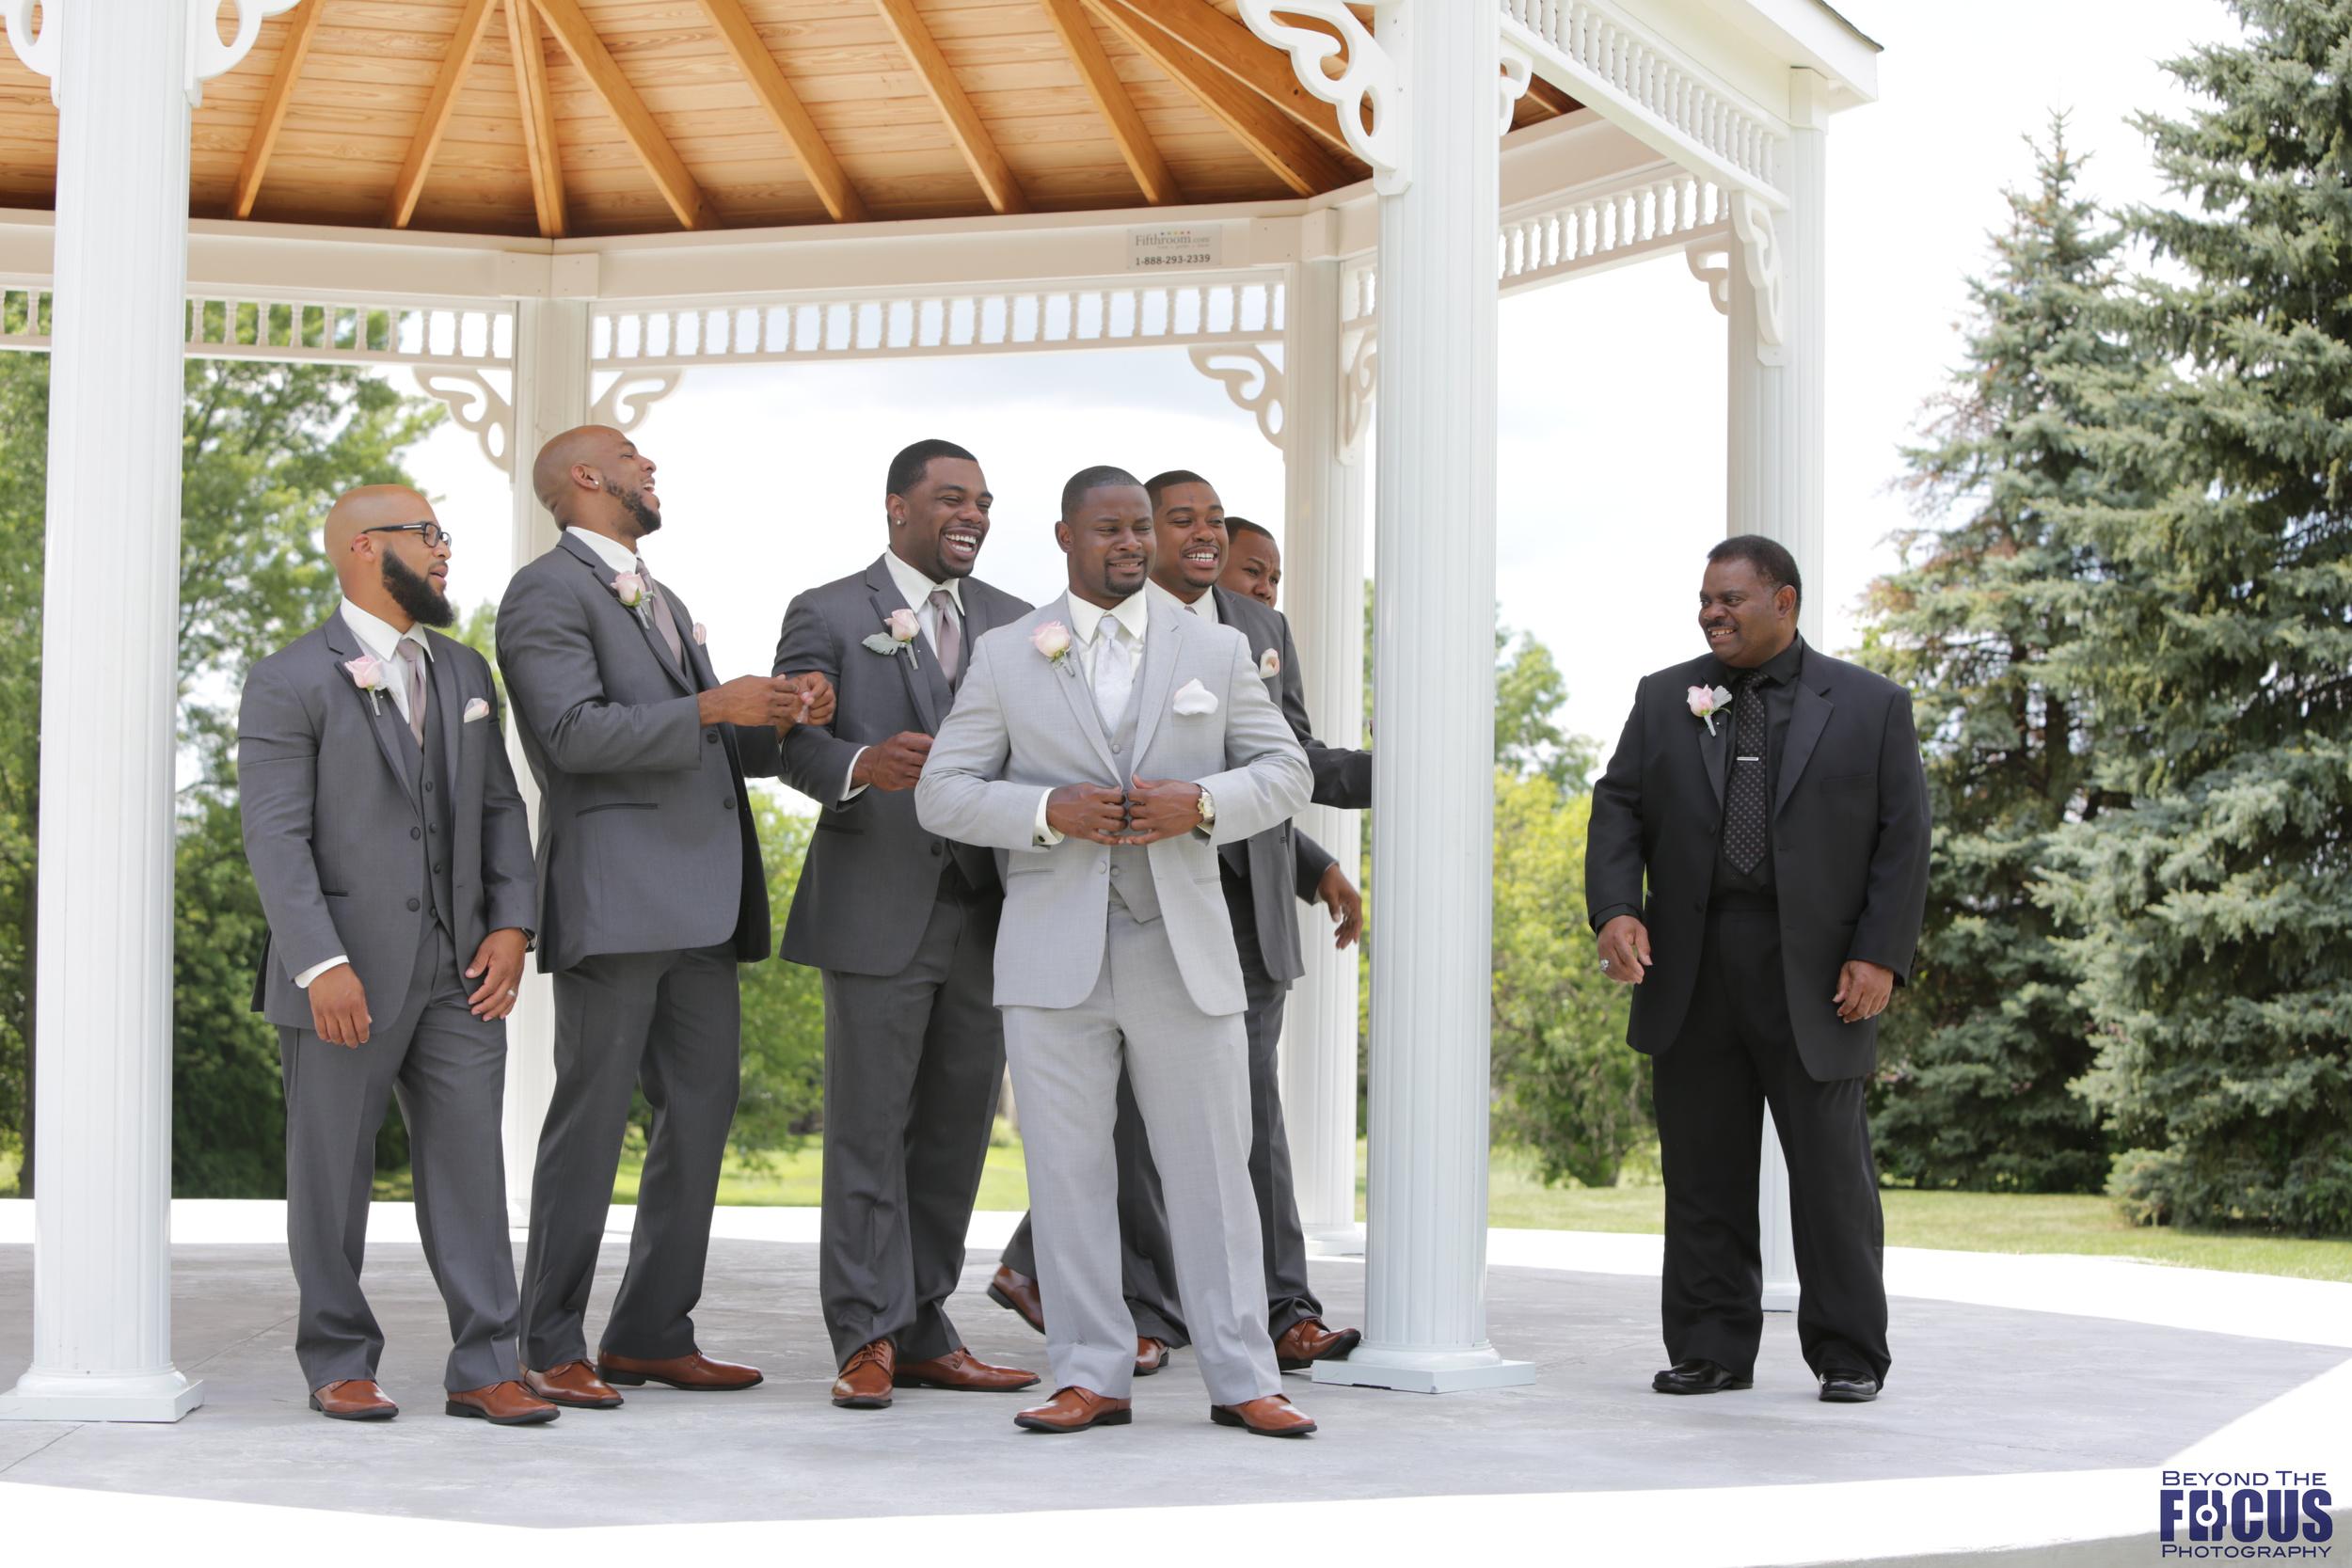 Palmer Wedding - Candids10.jpg